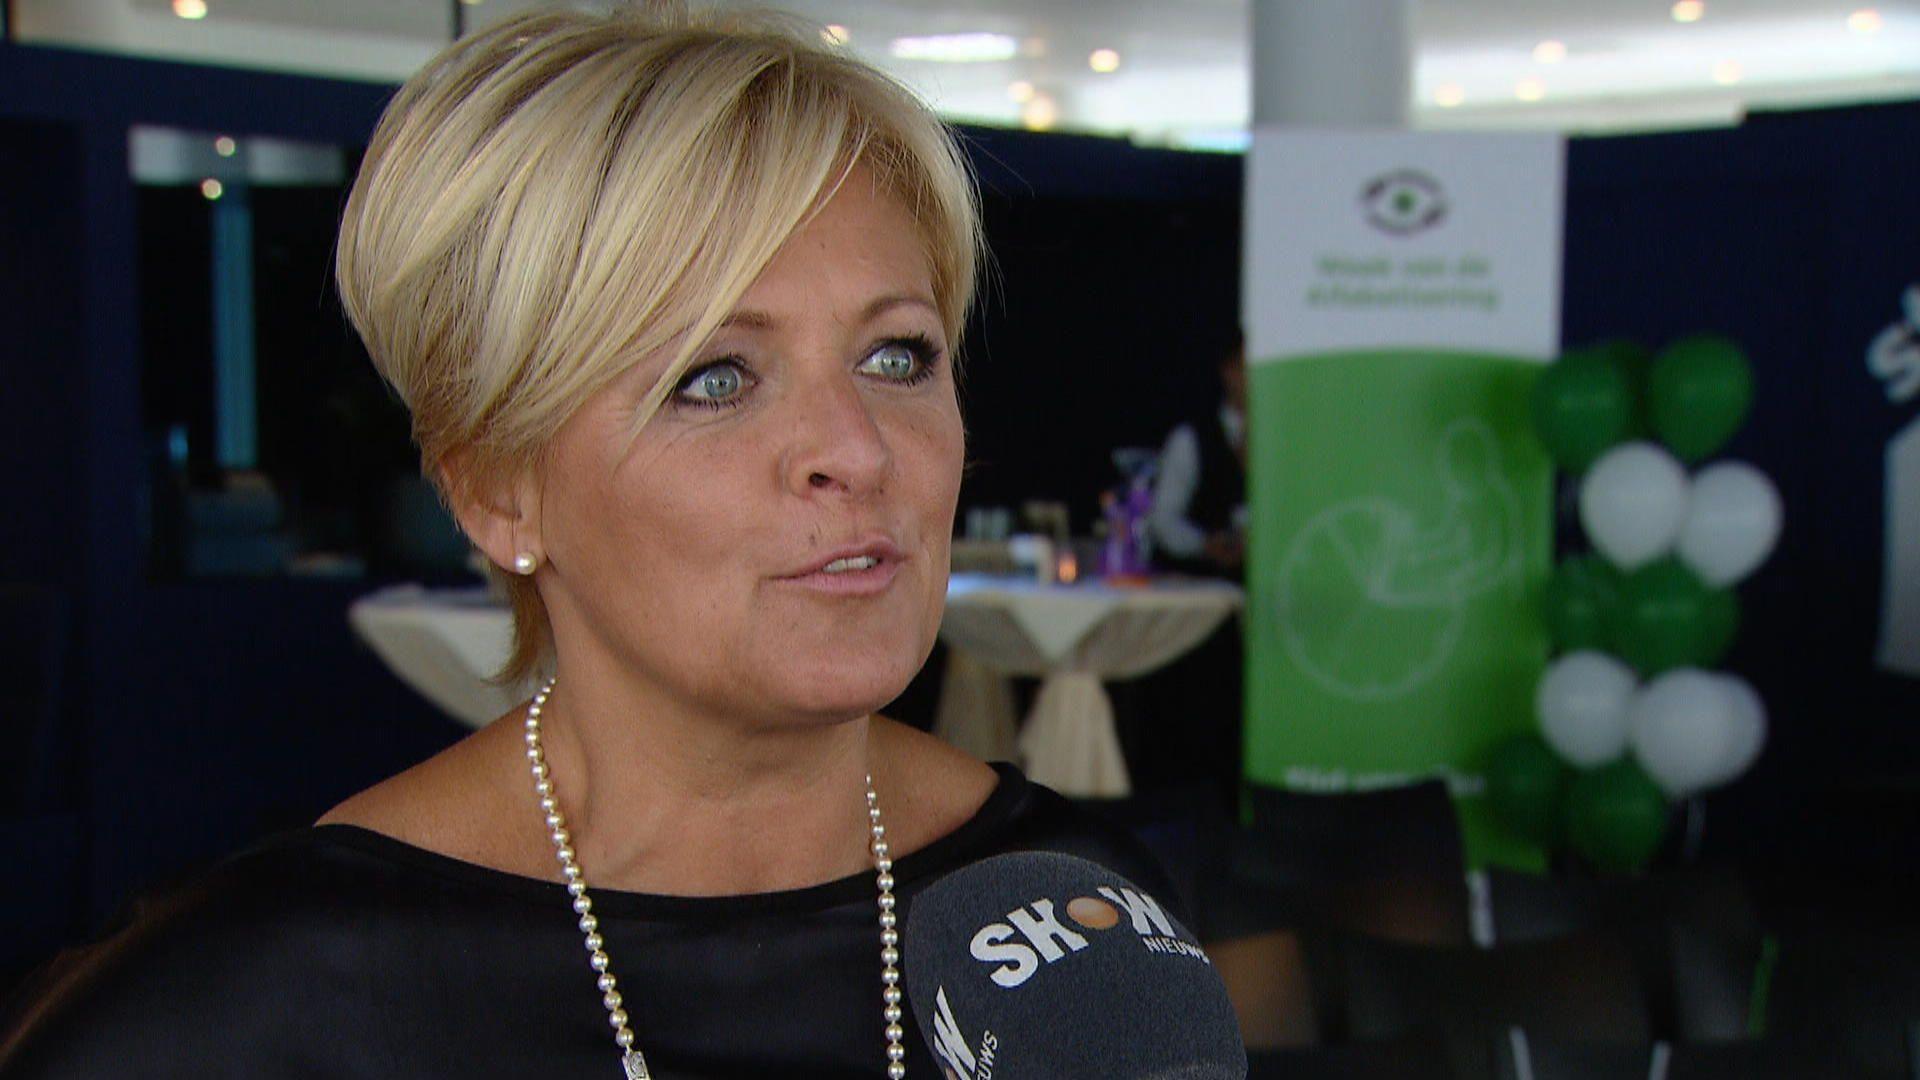 Caroline Tensen Nieuw Kapsel Kapsels Korte Kapsels Dames Kapsels Dun Haar